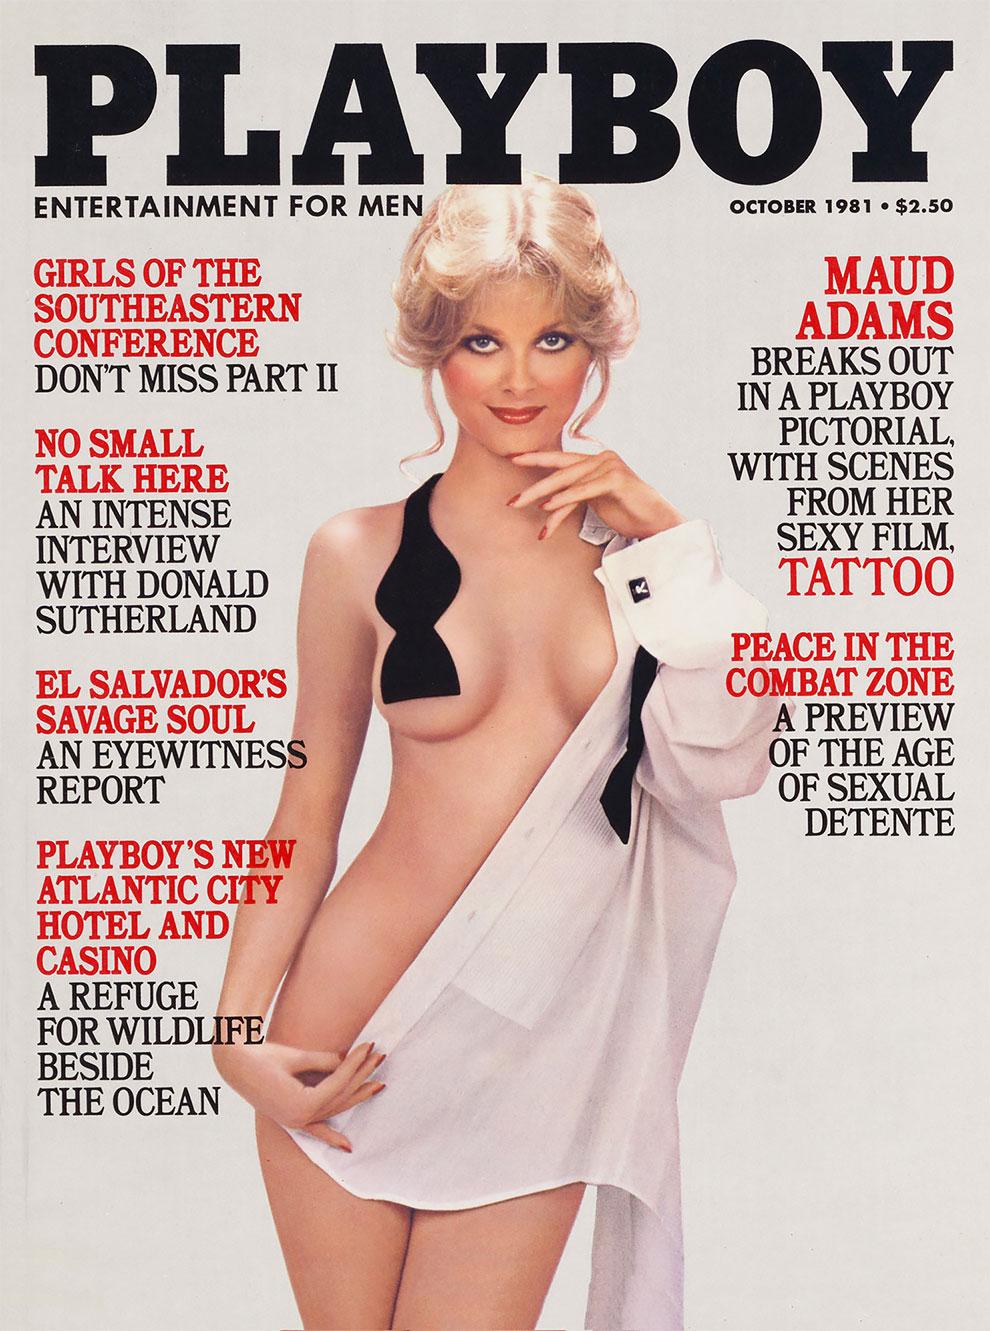 Playboy Playmates 30 anos despues 7